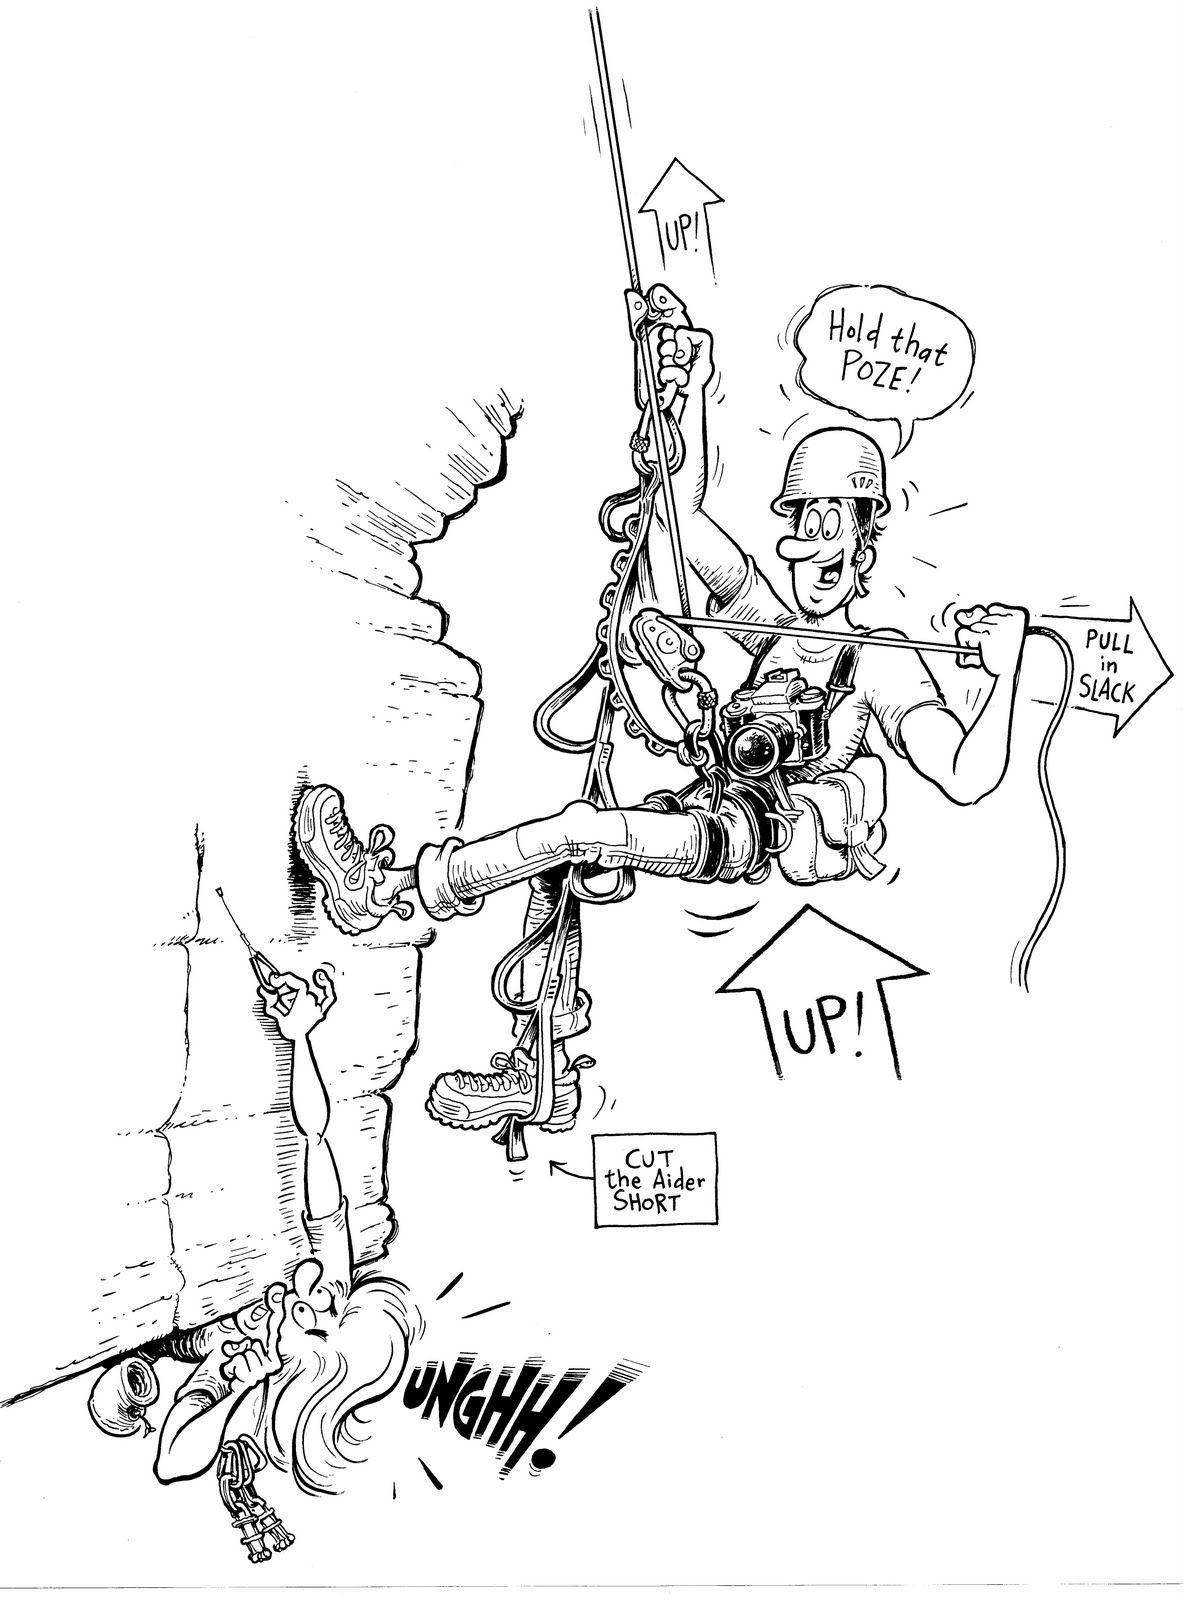 Mike Clelland Cartoons